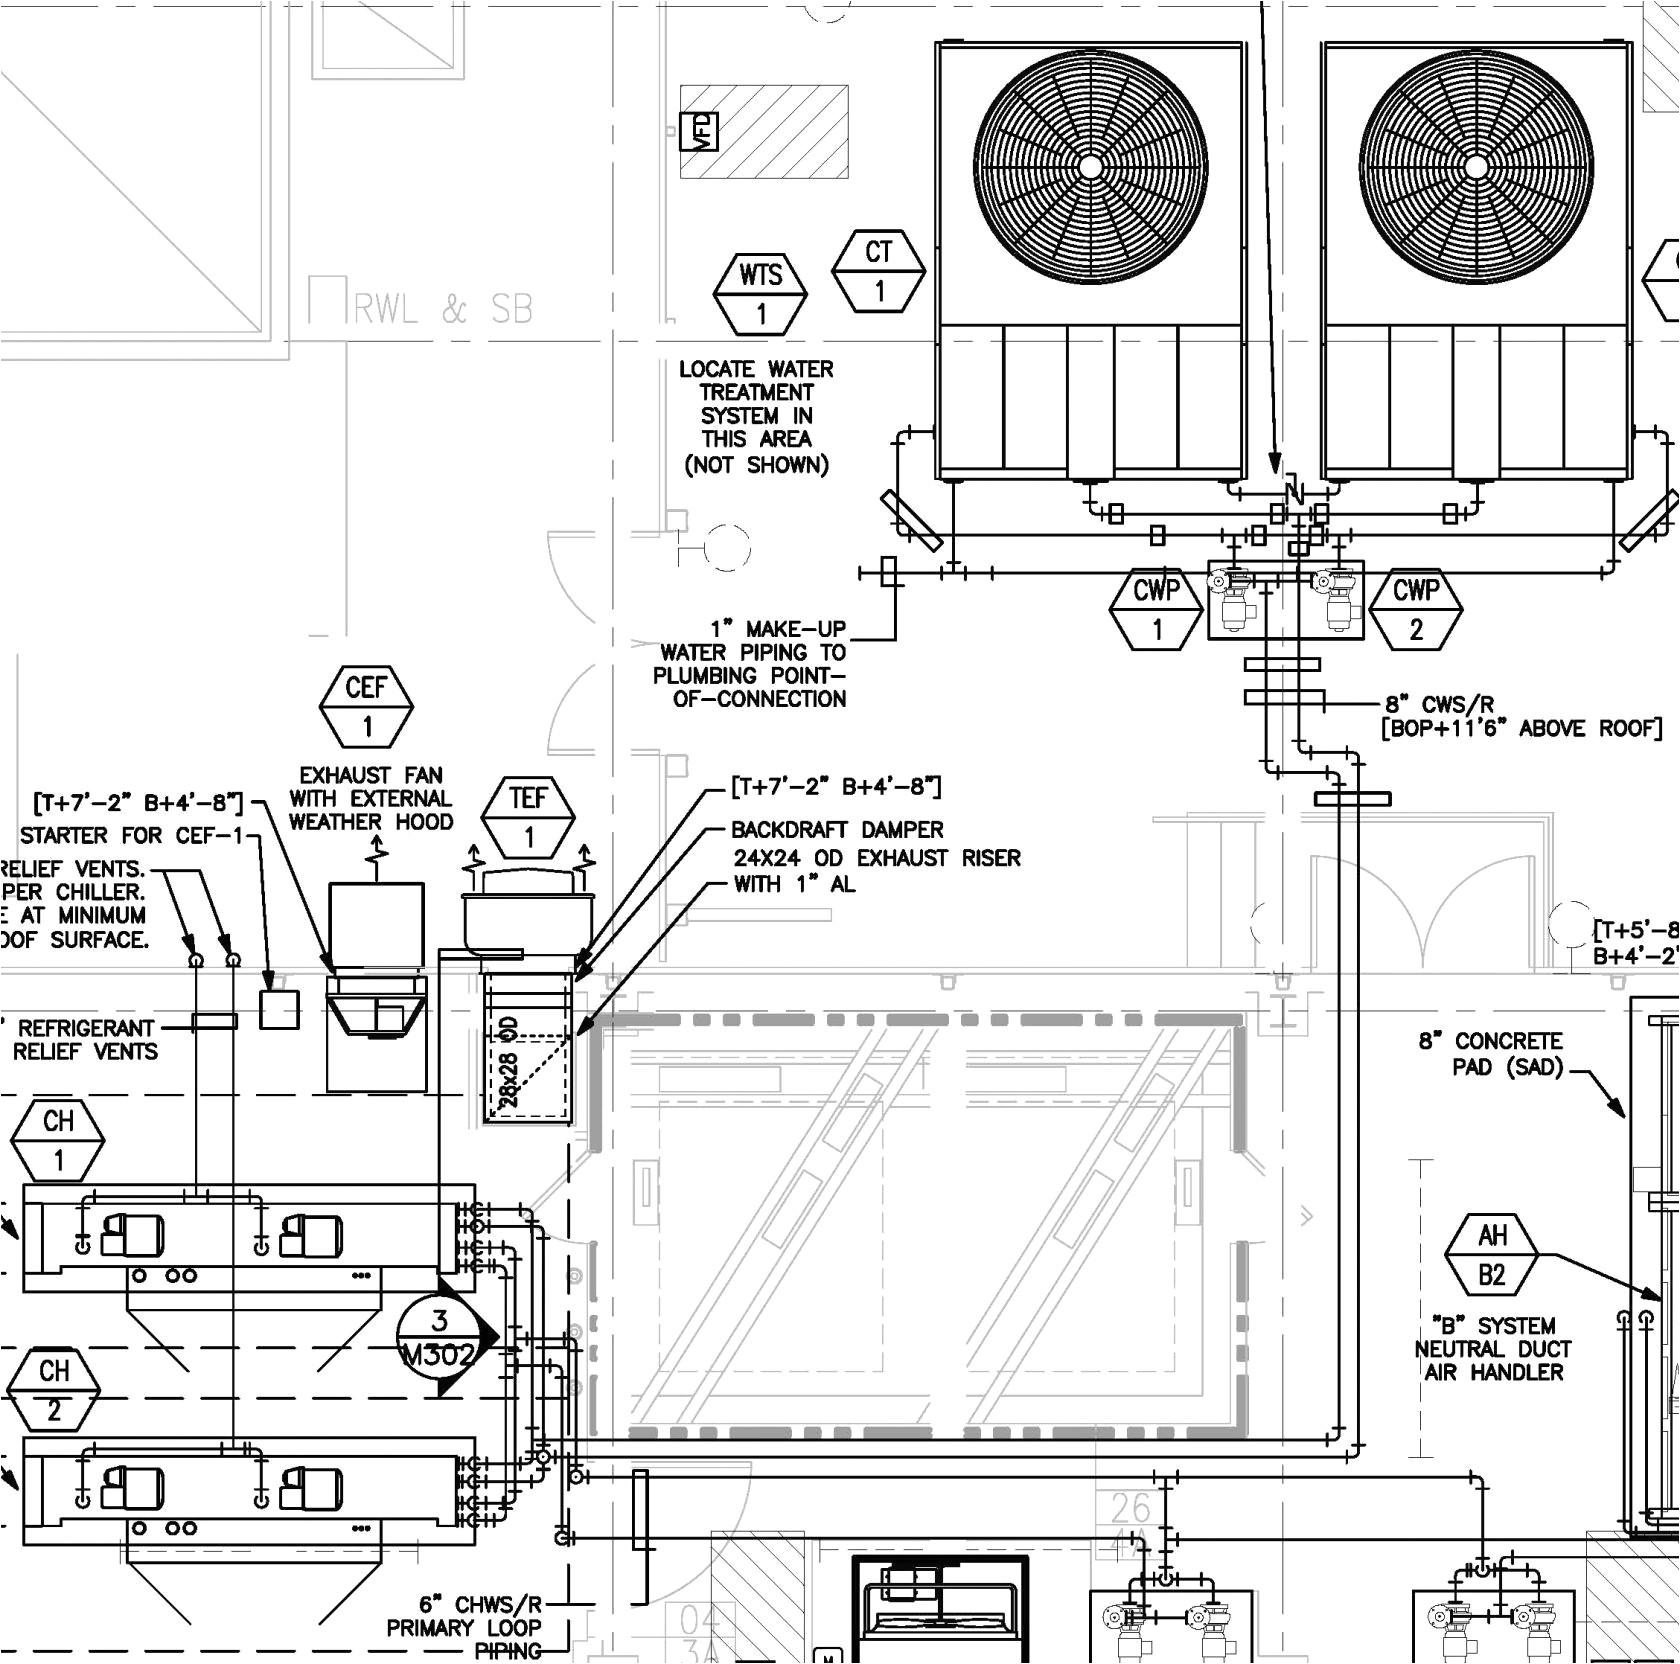 john deere la115 wiring diagram best of john deere x320 wiring diagram popular john deere x320 wiring